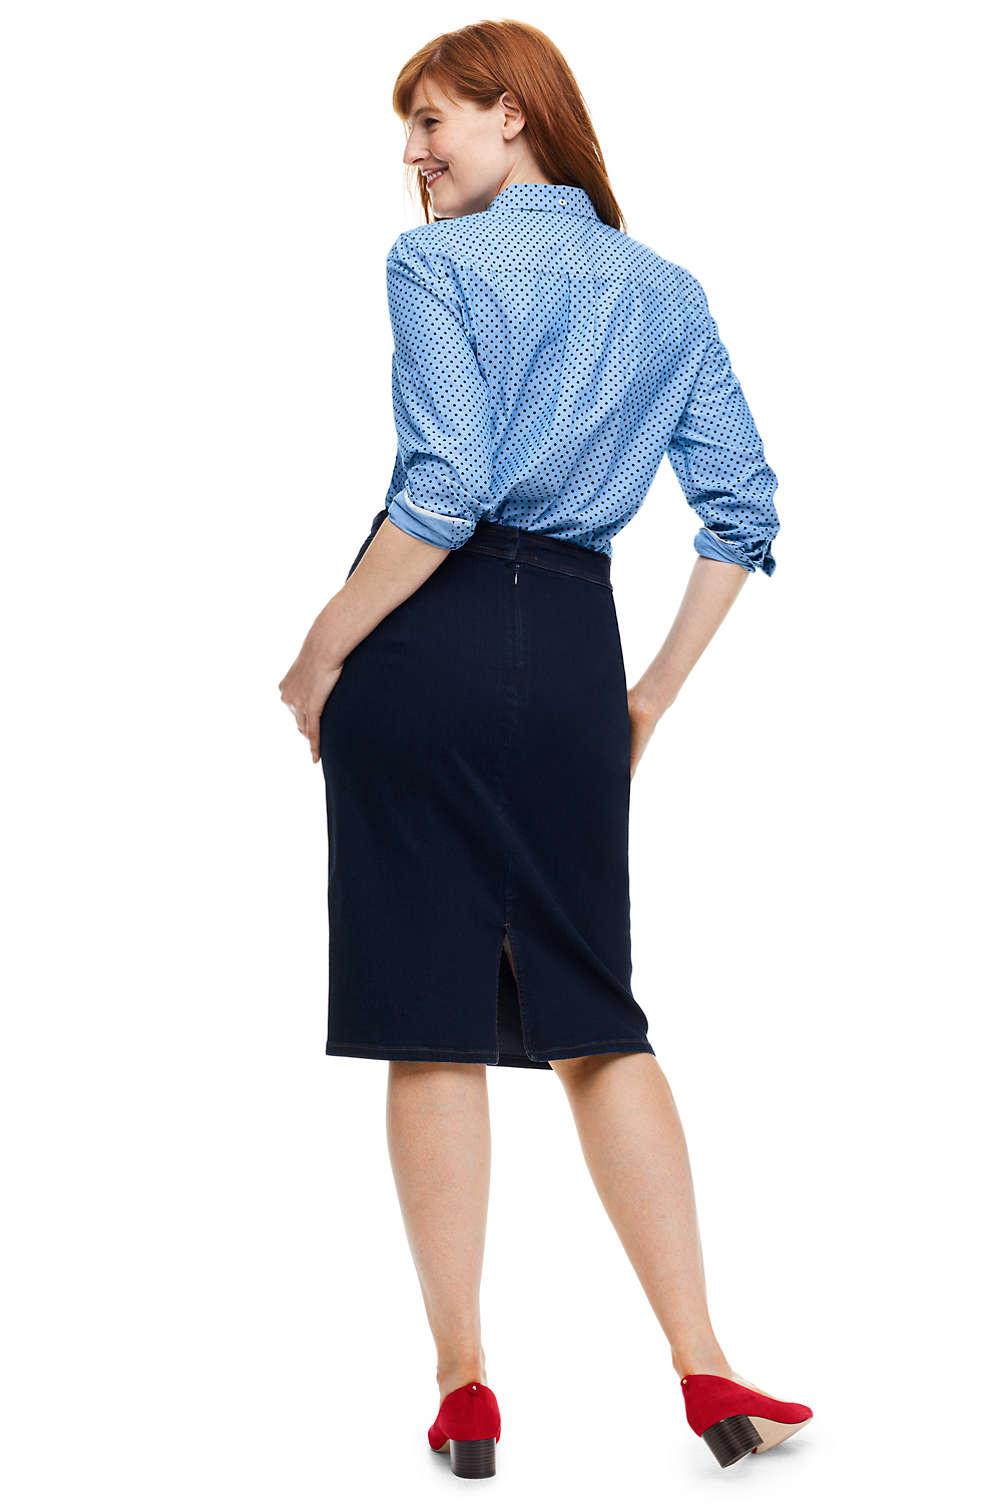 983cbb074d4ee Women s Plus Size Jean Pencil Skirt from Lands  End